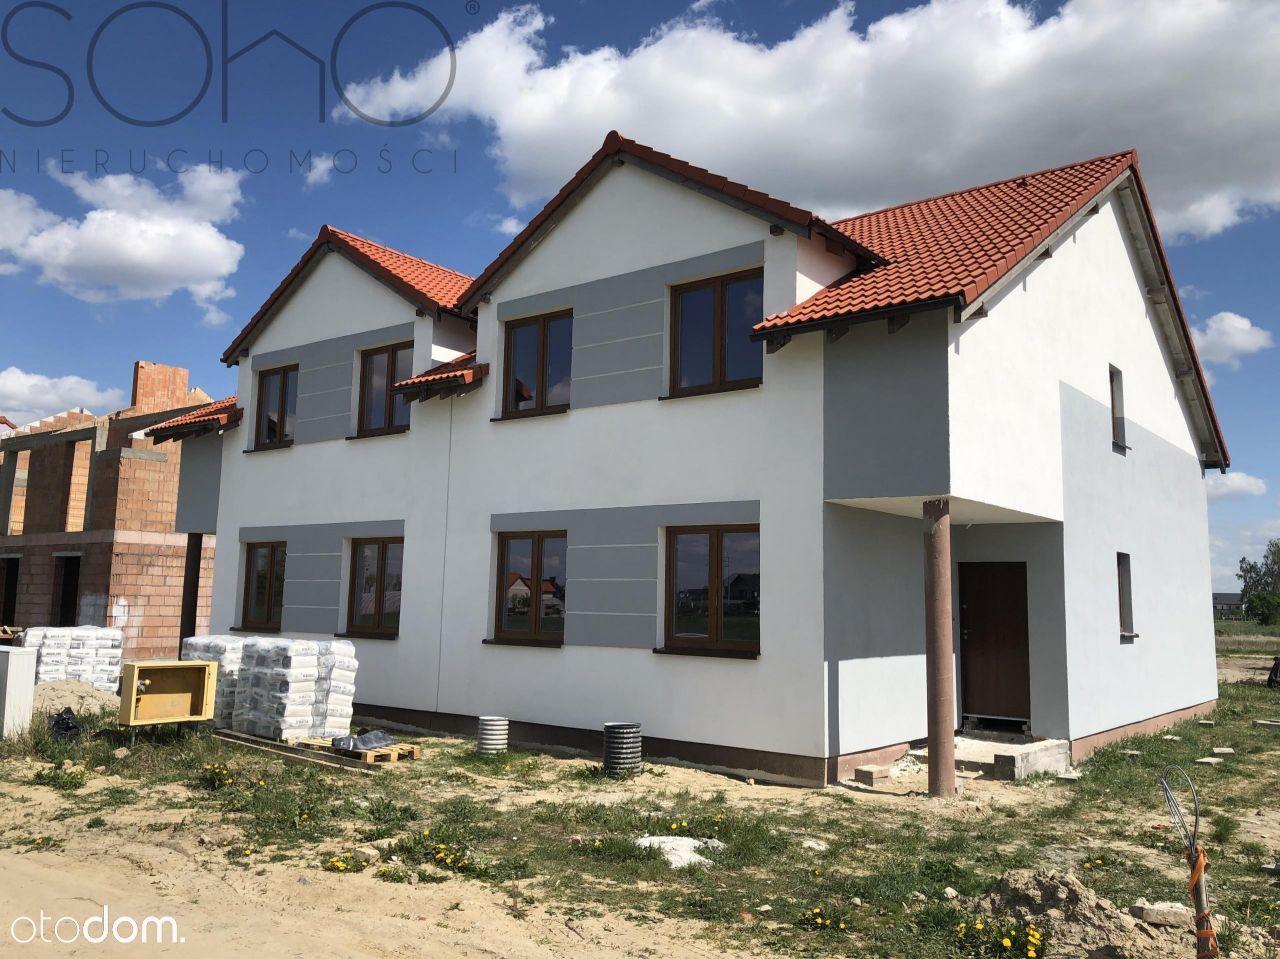 Mieszkanie, 90 m², Dachowa